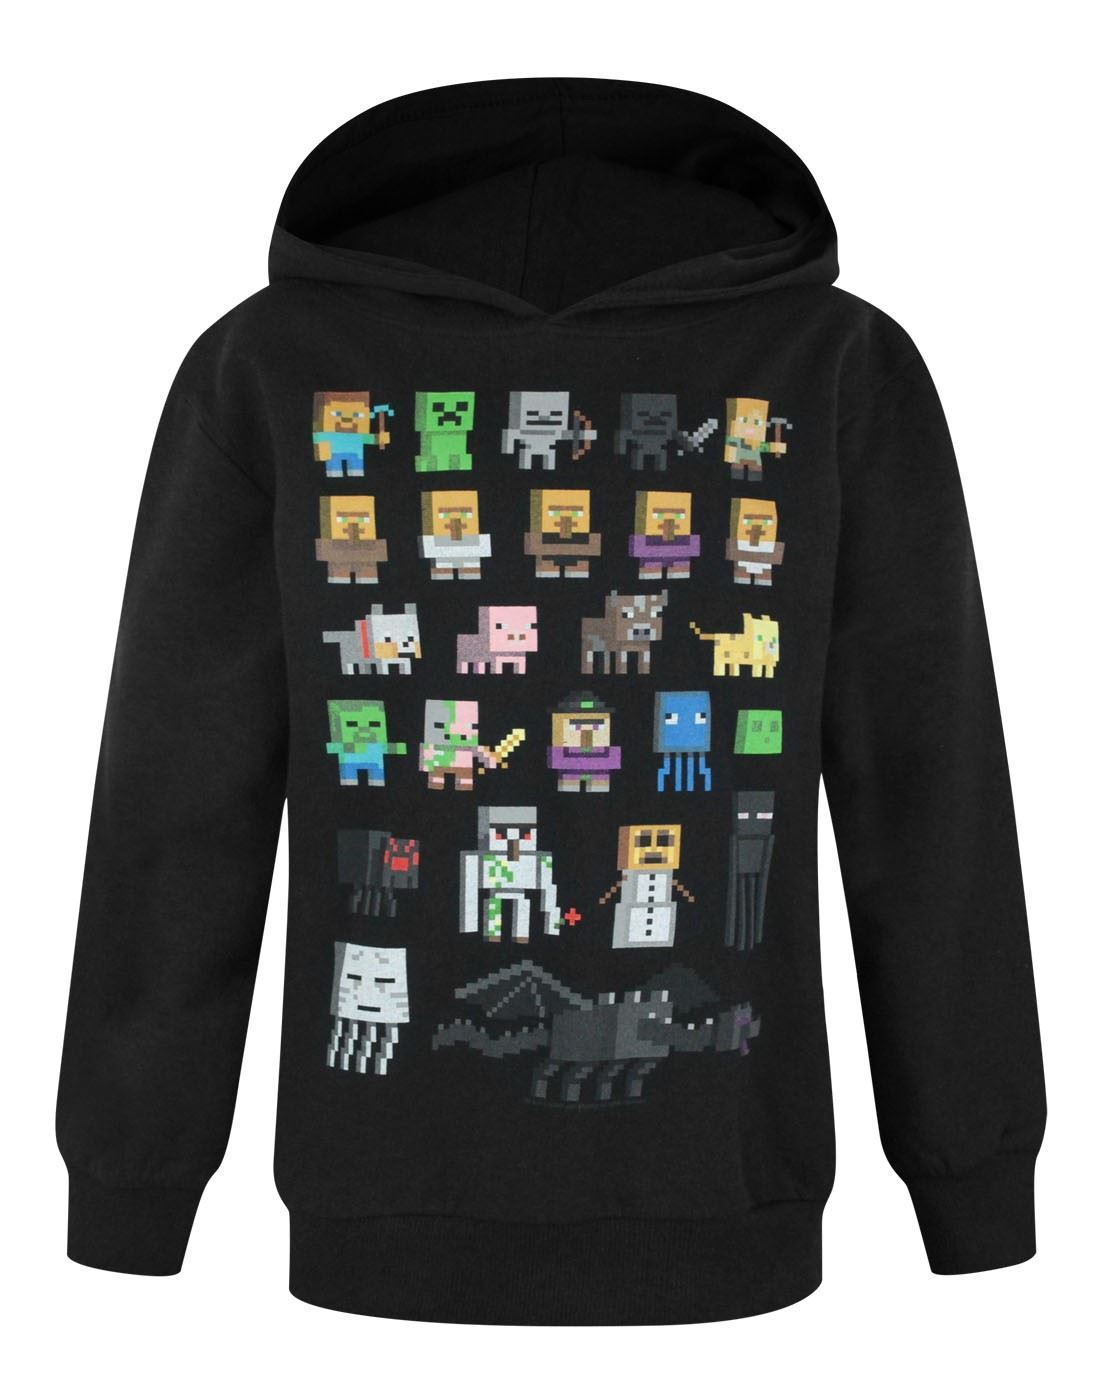 Minecraft hoodies